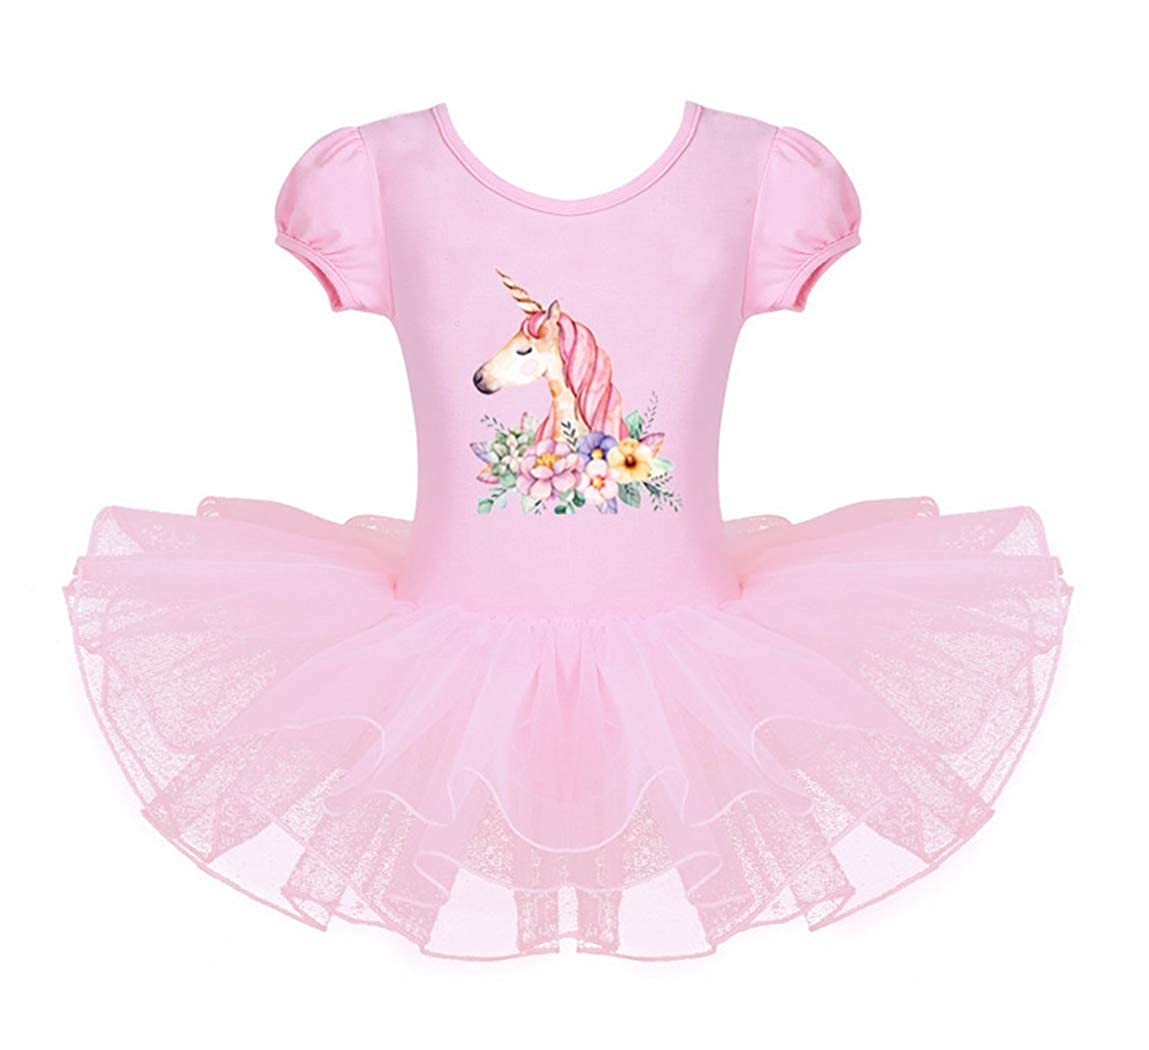 AmzBarley Girls Unicorn Ballet Leotard Dress with Tutu Skirt Ballerina Kids Gymnastics Leotards Short Sleeve Cotton Dresses Child Unicorns Dance Outfit Clothing